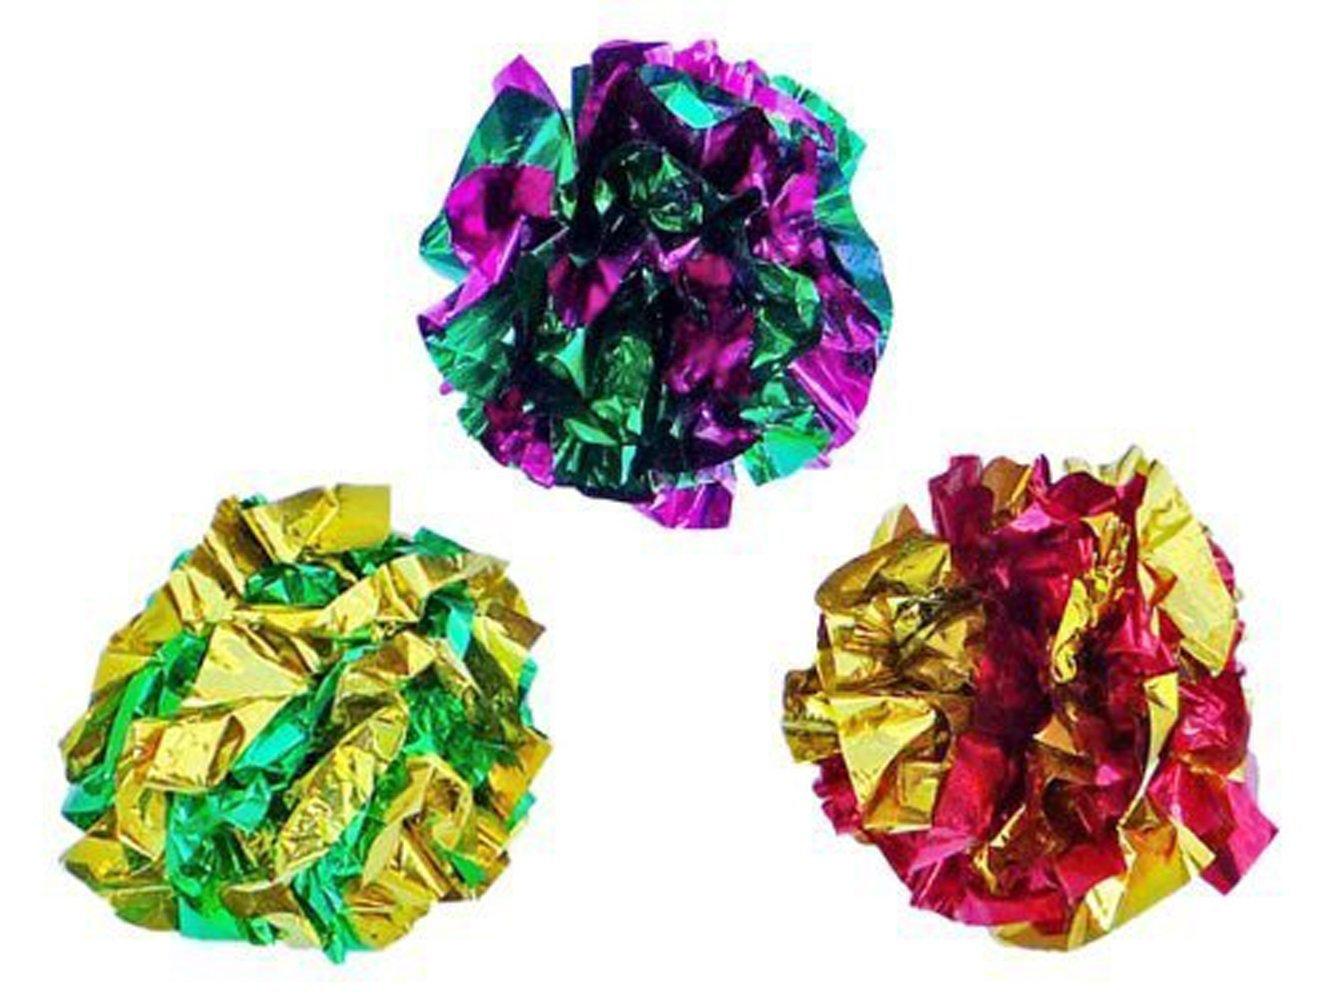 PetFavorites Original Mylar Crinkle Balls Cat Toys 3